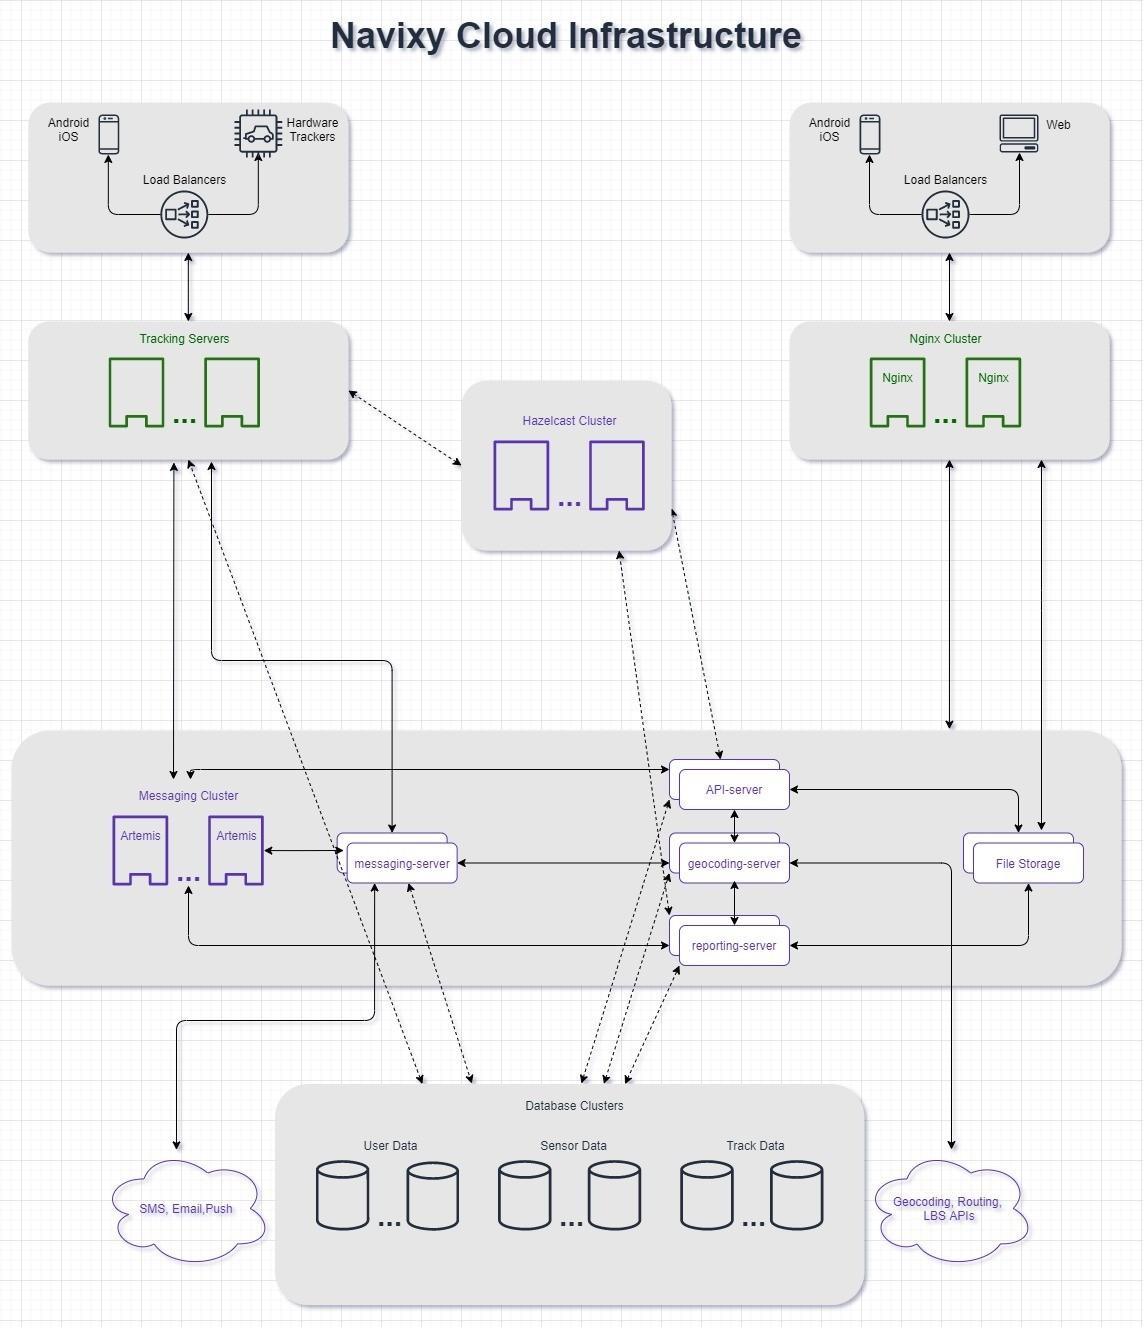 Navixy cloud architecture